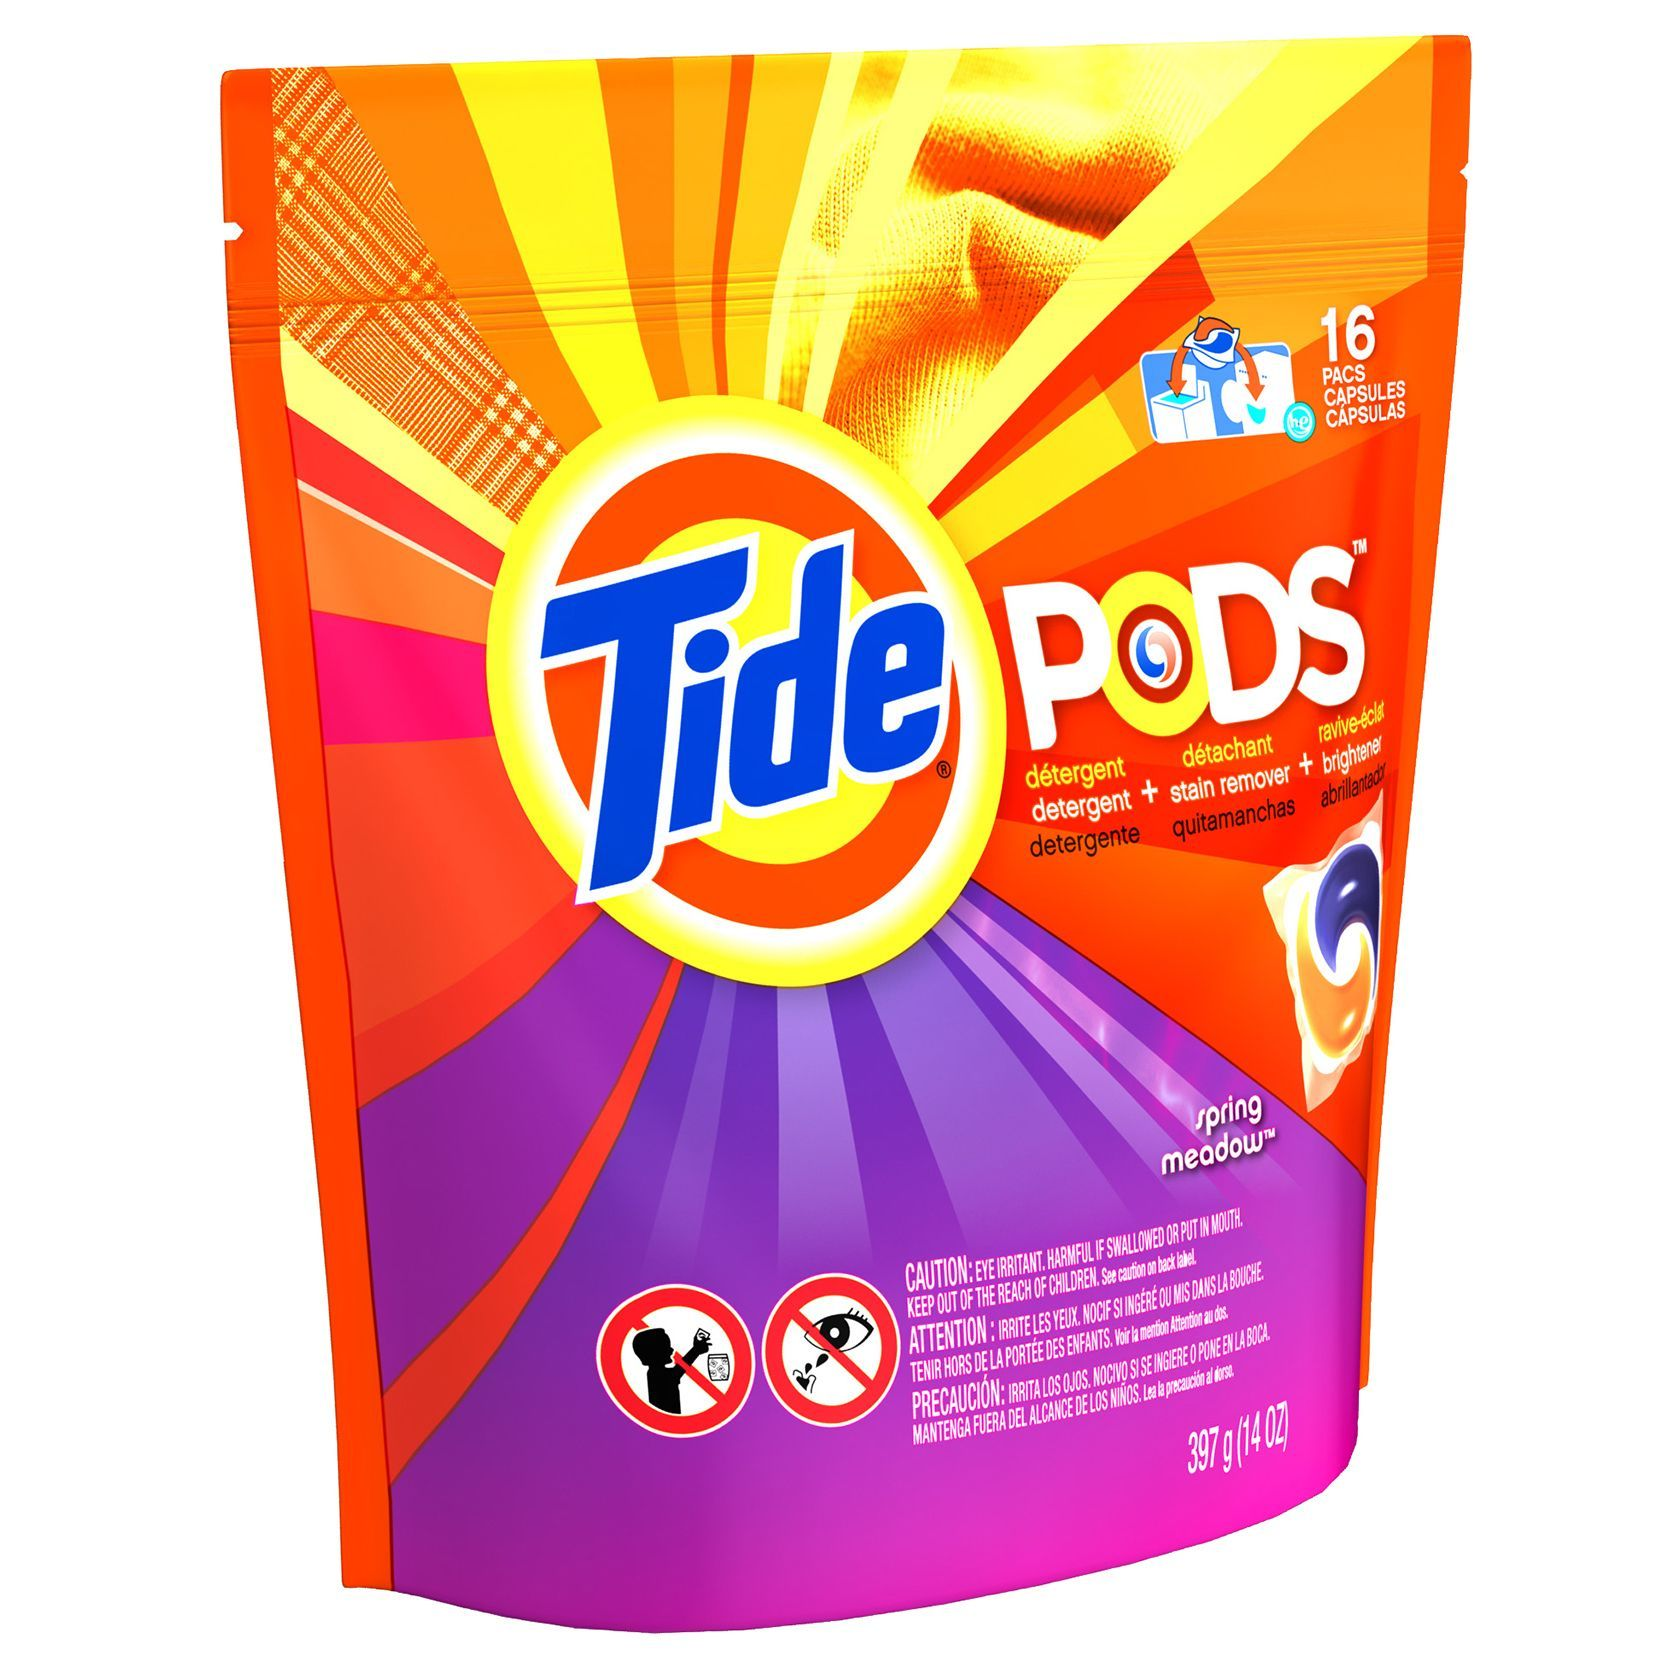 Jensen Tide 93120 Spring Meadow 3 In 1 Tide Laundry Detergent Pods